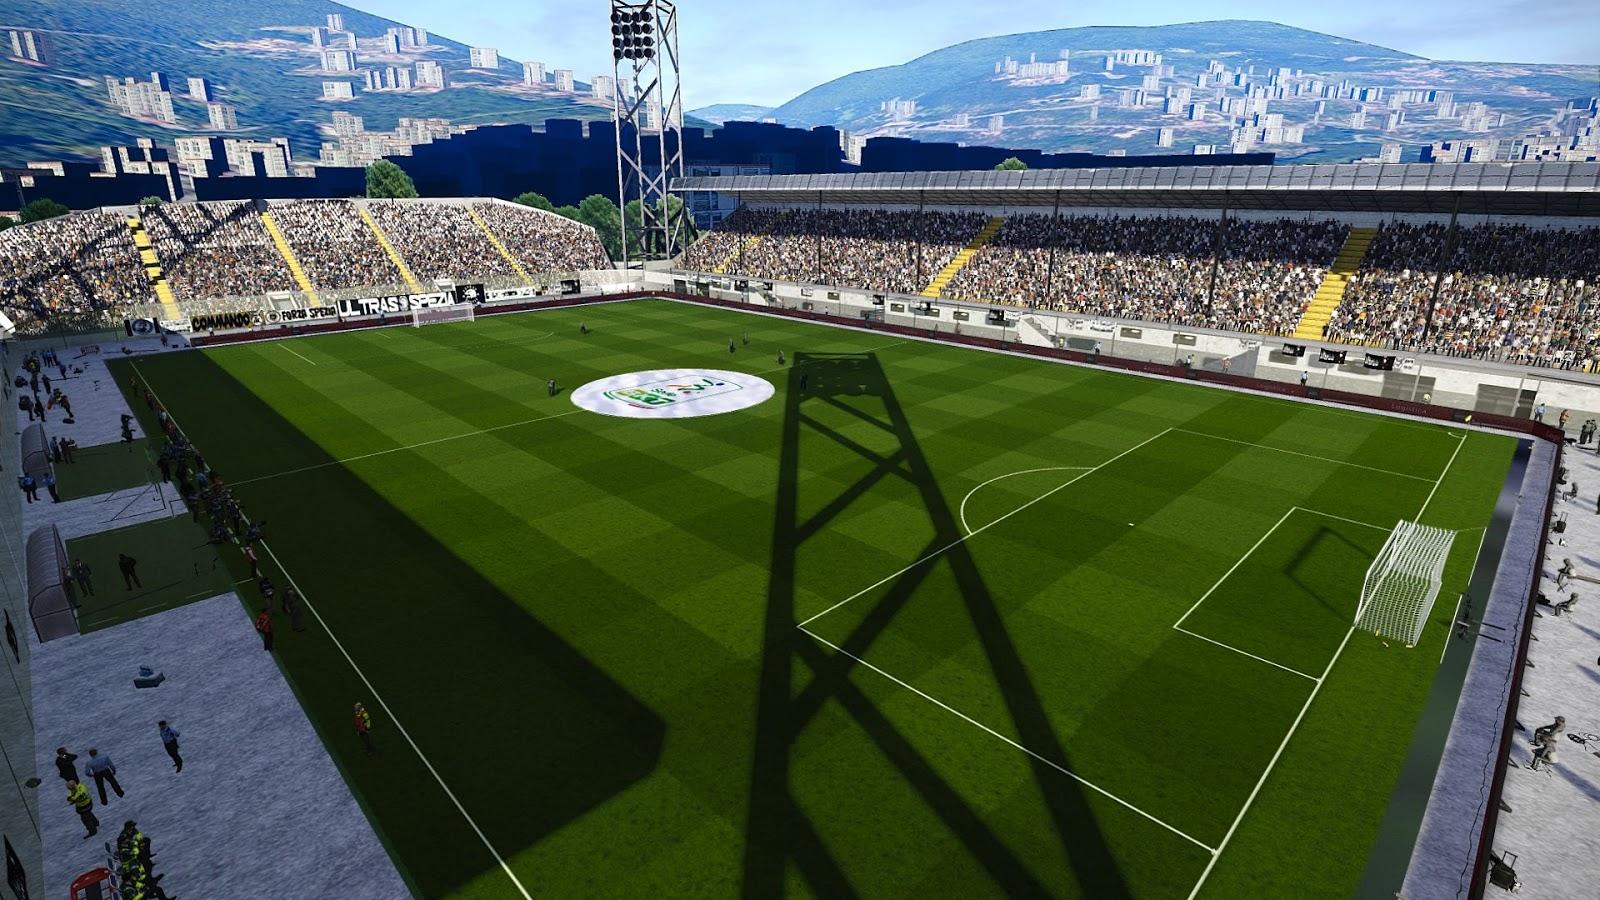 PES 2020 Stadium Alberto Picco ~ PESNewupdate.com | Free Download Latest  Pro Evolution Soccer Patch & Updates